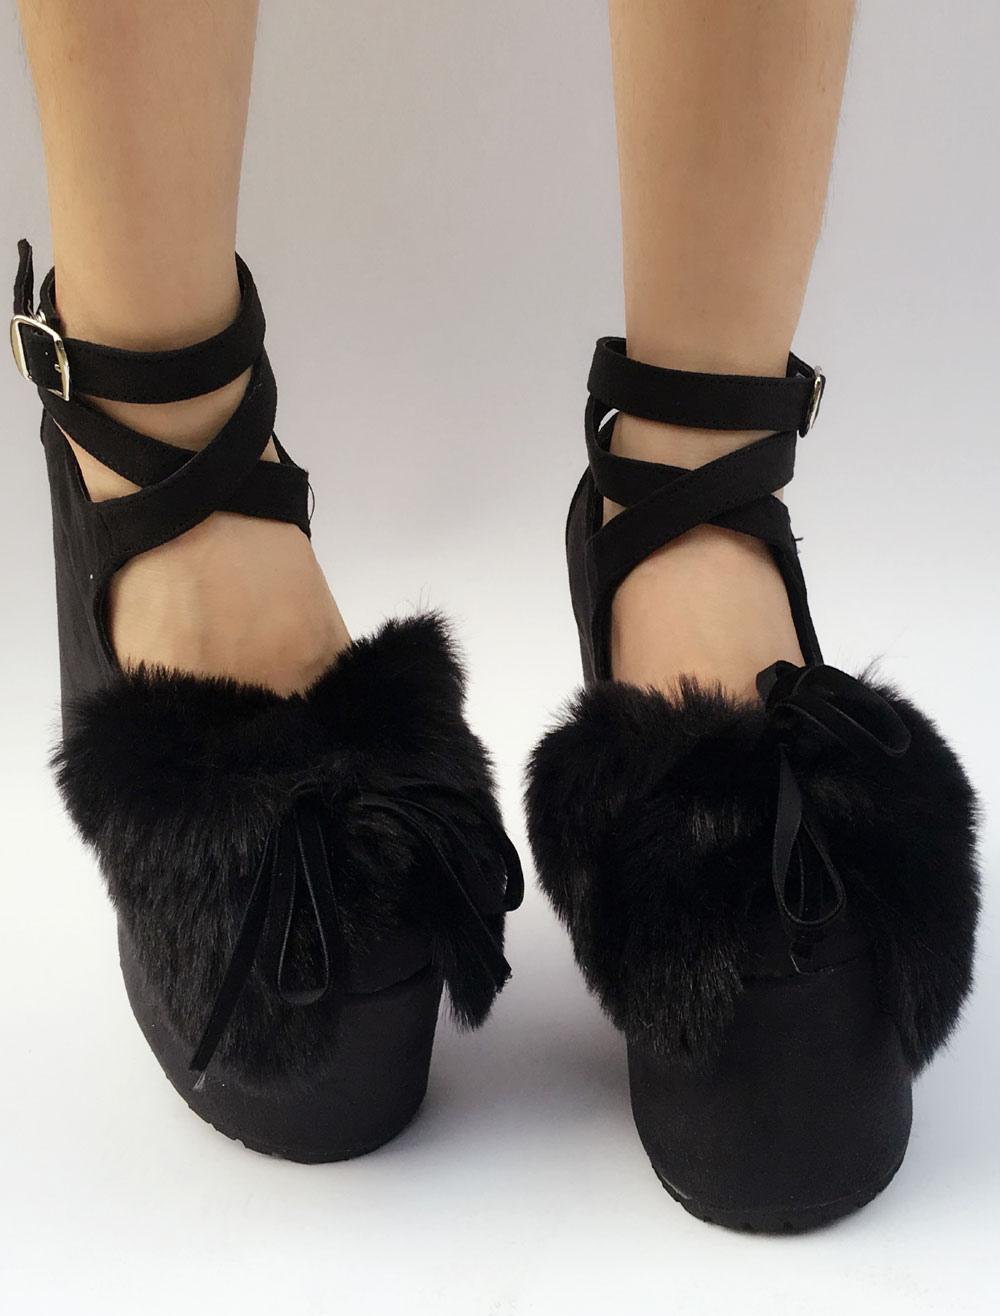 Ante Lolita zapatos negros plataforma tacón grueso piel sintética arco Cruz tobillo frontal correa Lolita bombas IngmxNVV